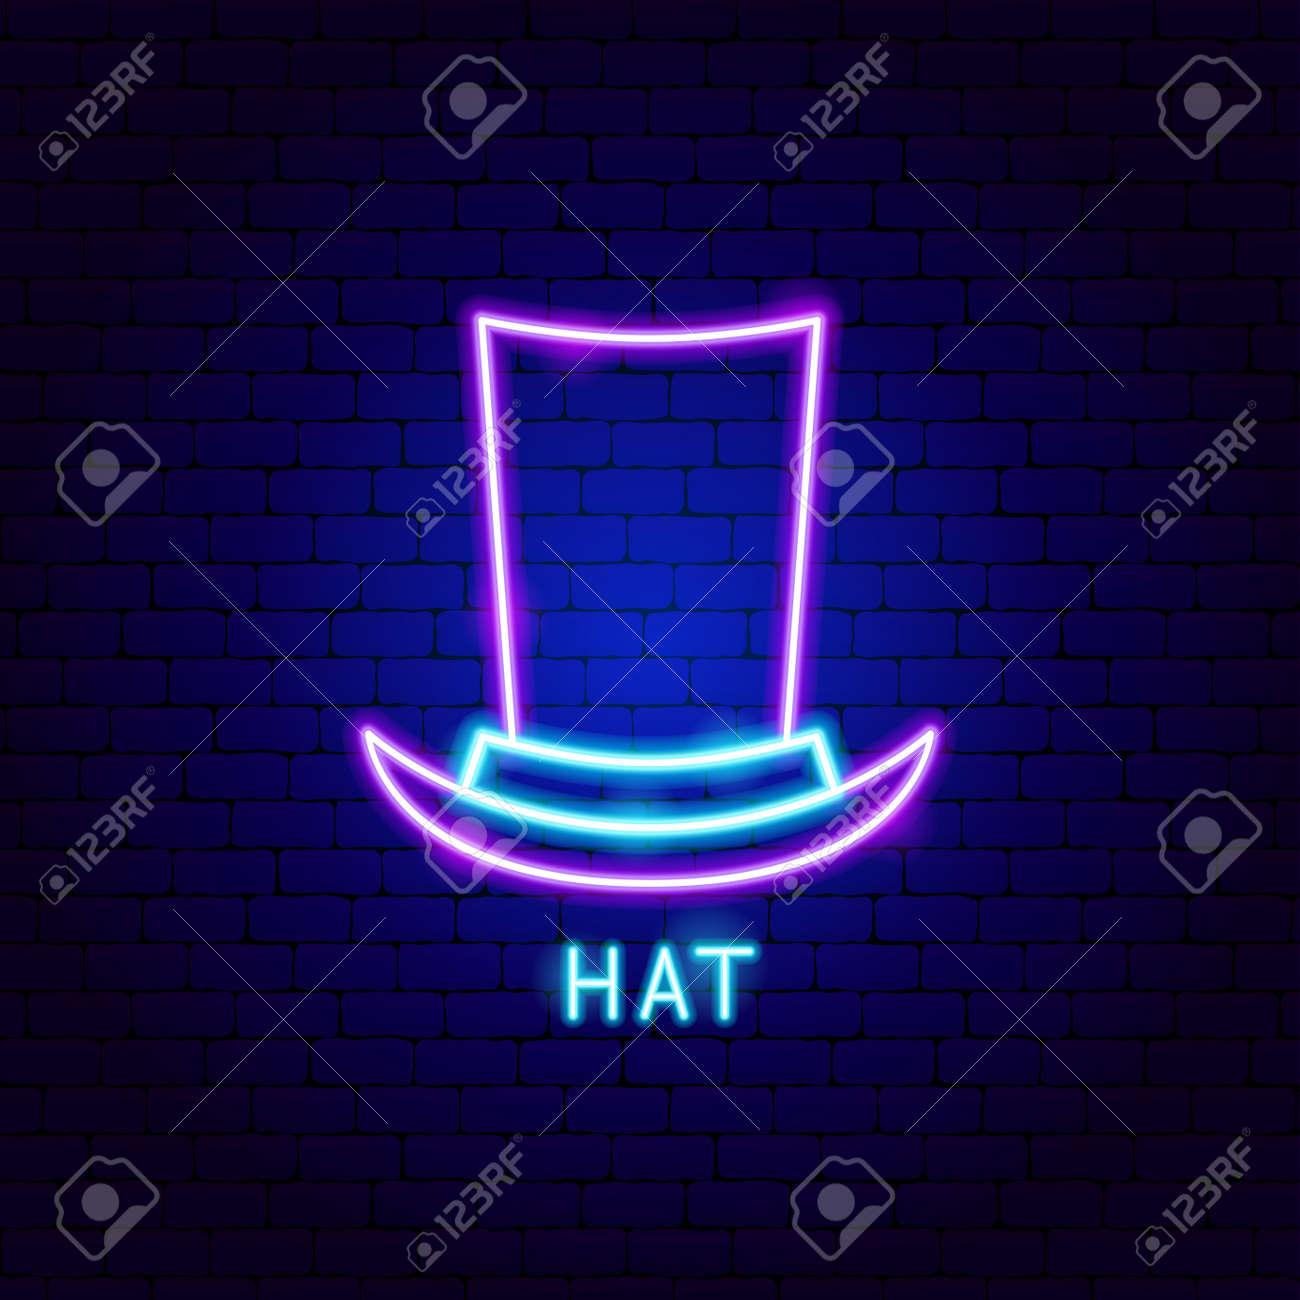 Hat Neon Label - 168963056